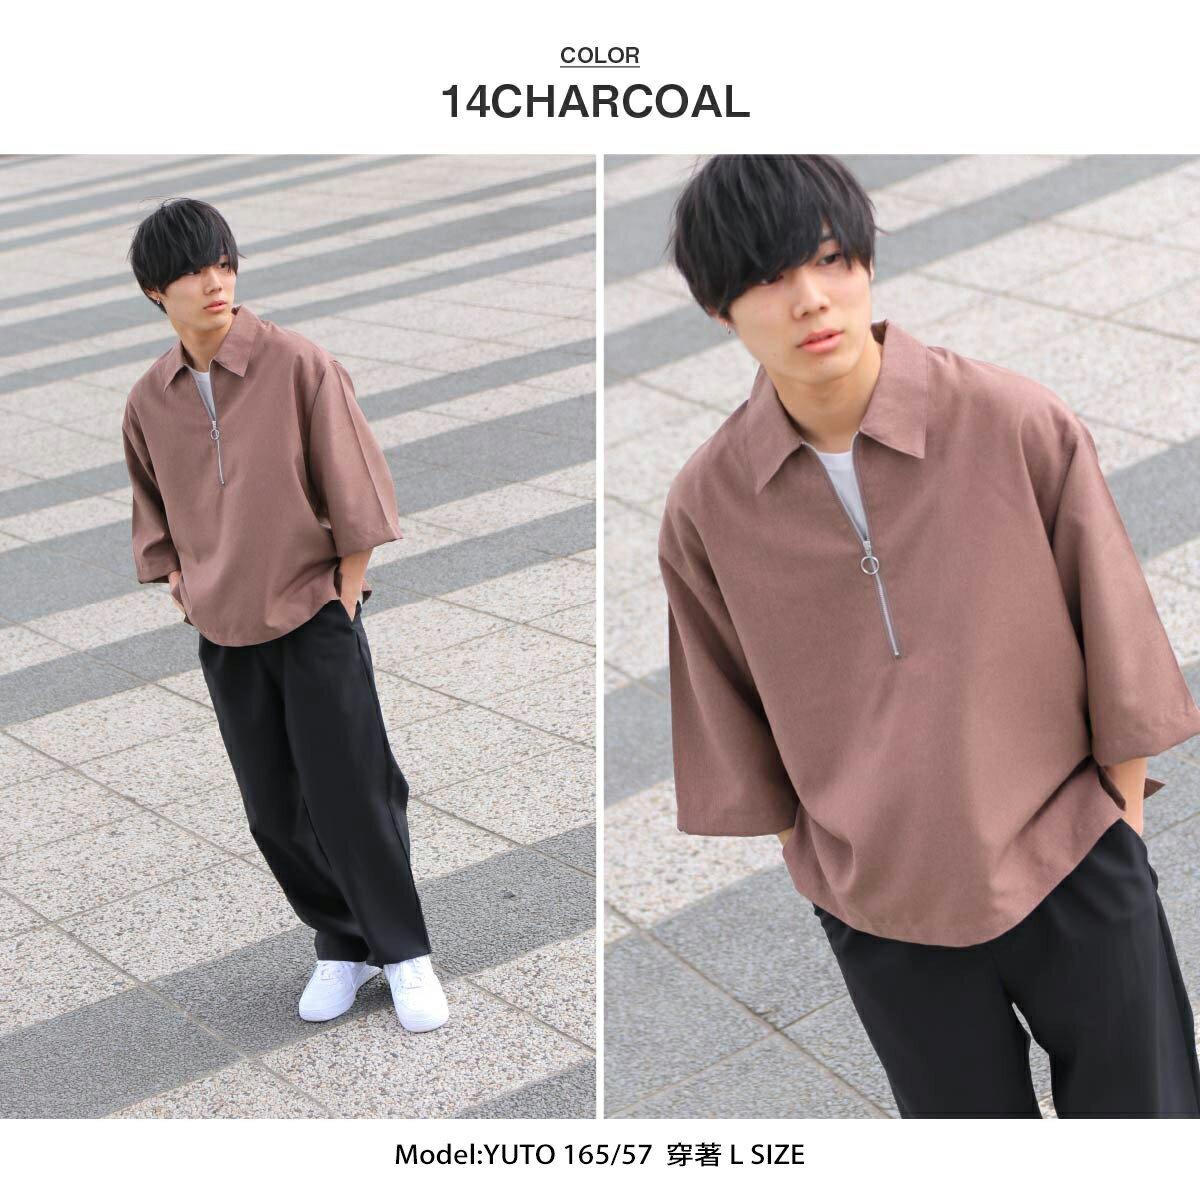 【ZIP】半拉鍊套頭衫 短袖 ZIP FIVE 襯衫 短袖 春裝 6